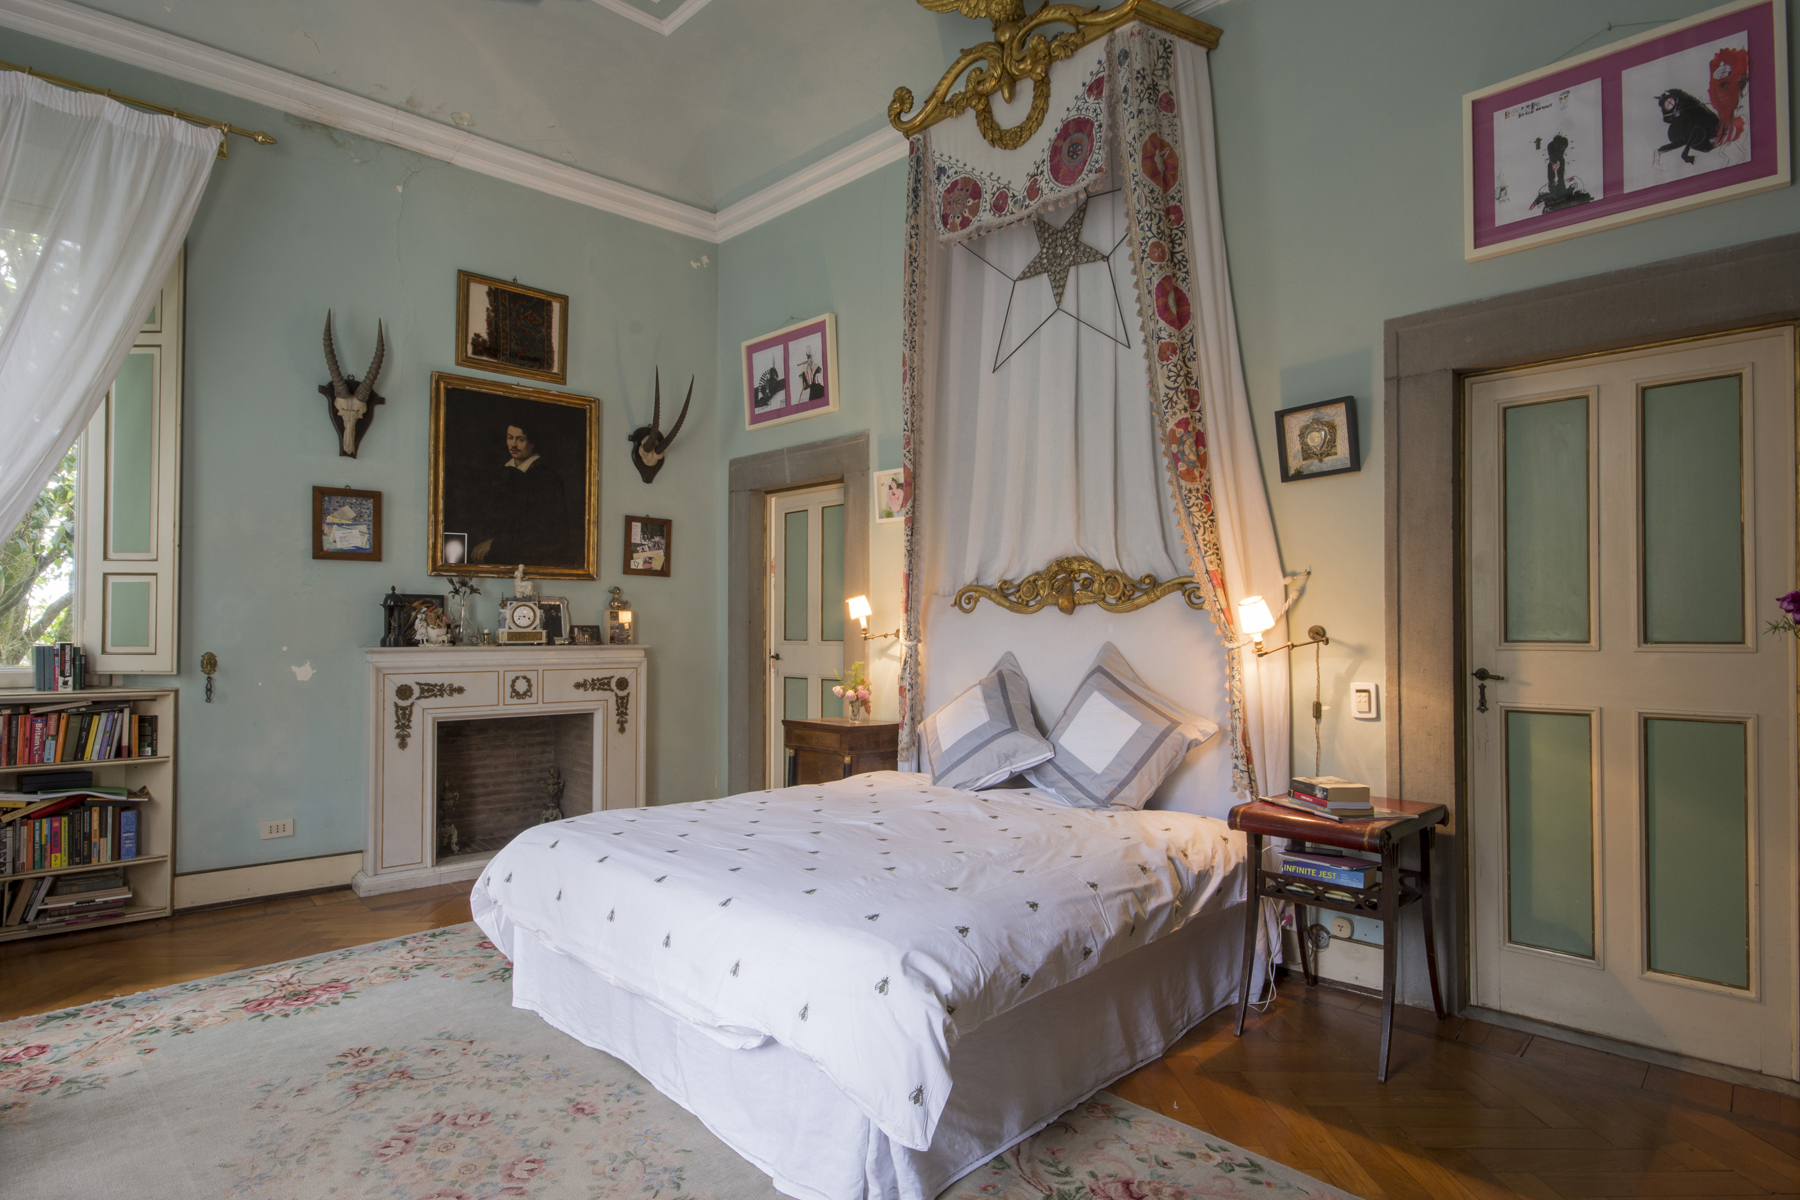 Villa in Vendita a Lucca: 5 locali, 2451 mq - Foto 12